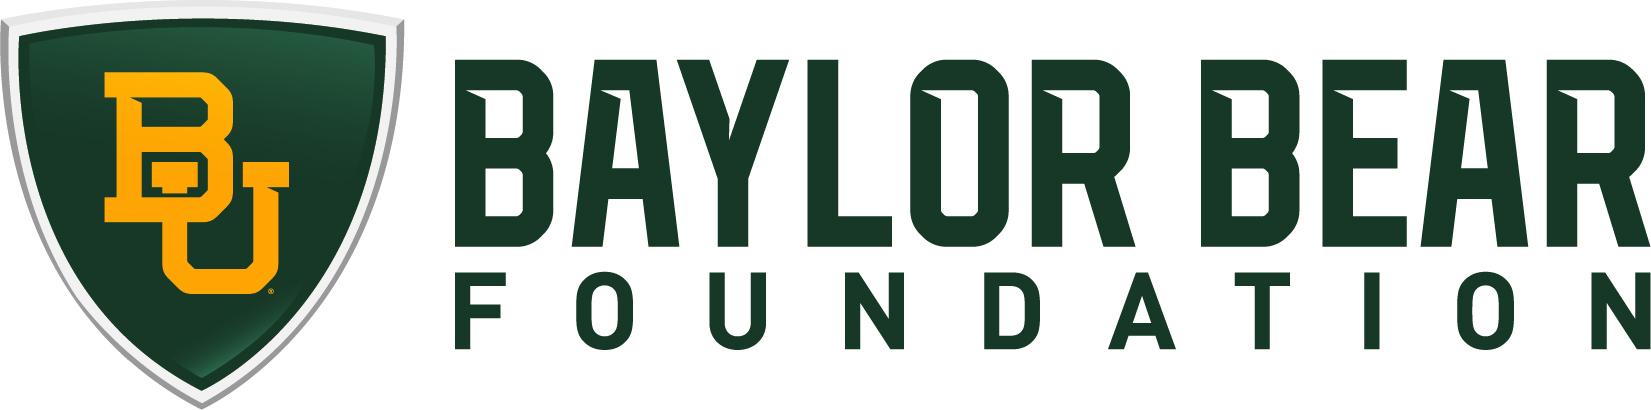 Baylor Bear Foundation